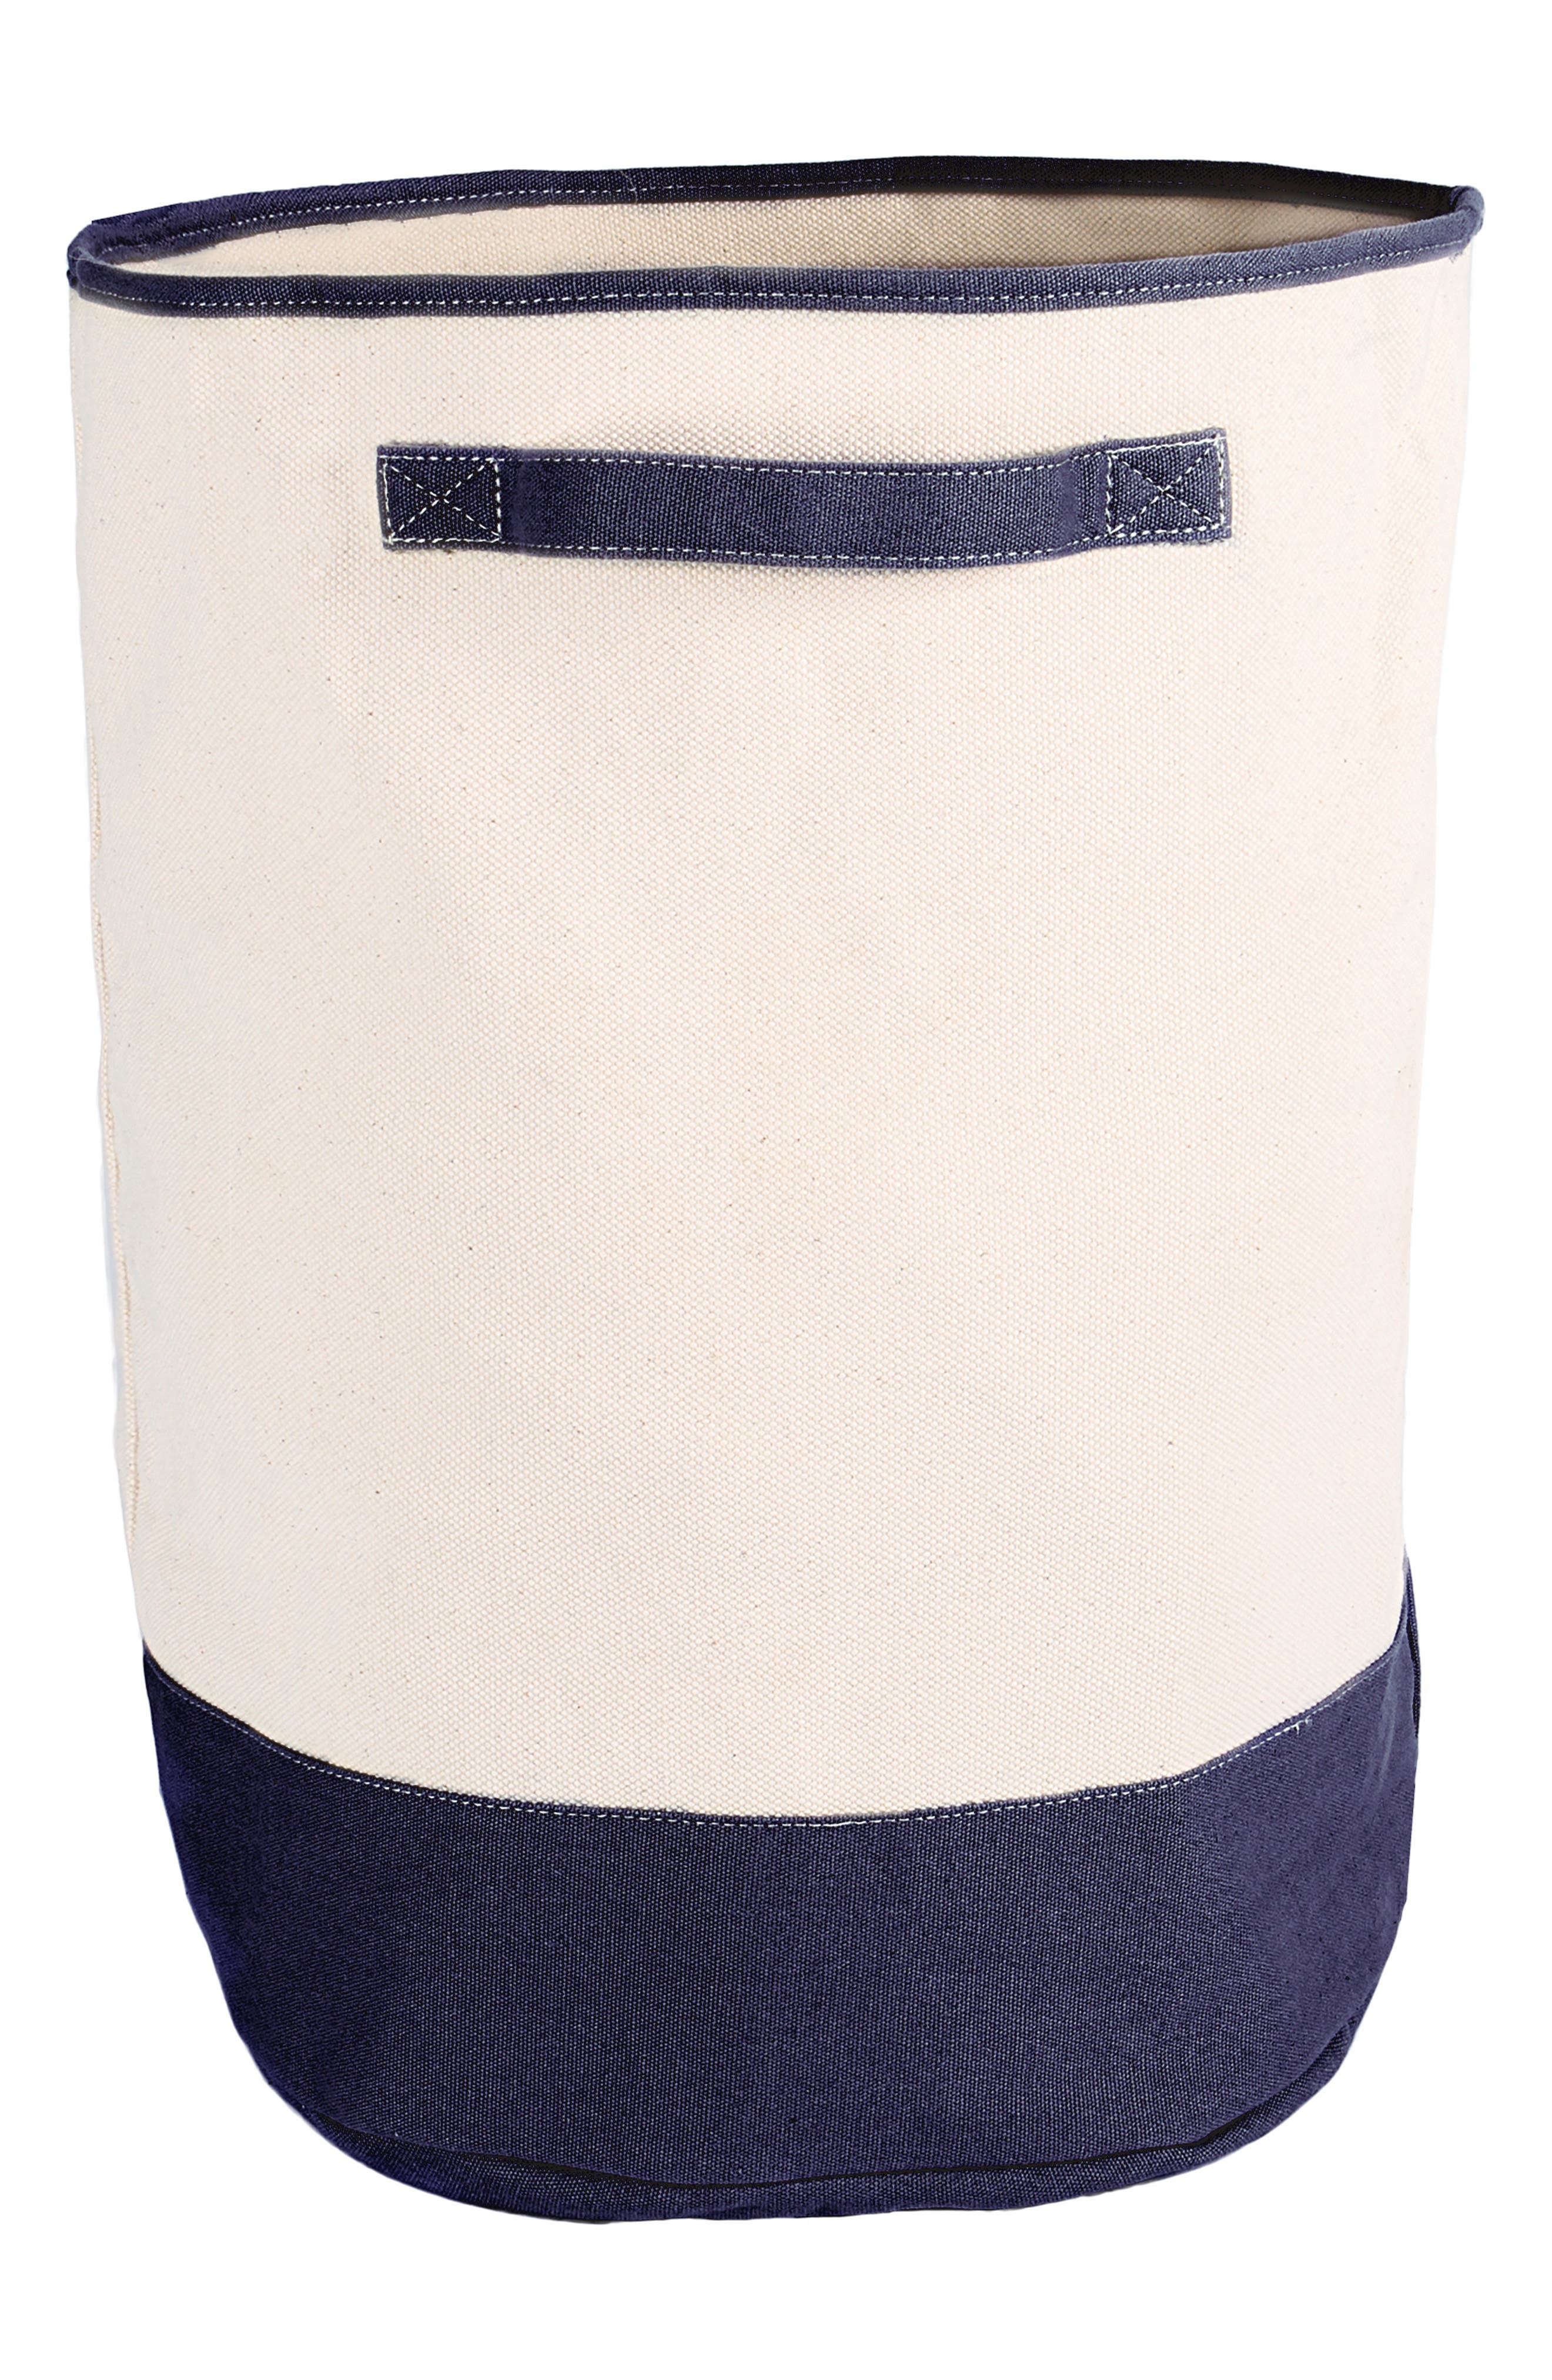 Monogram Round Canvas Hamper,                             Main thumbnail 1, color,                             Navy - Blank